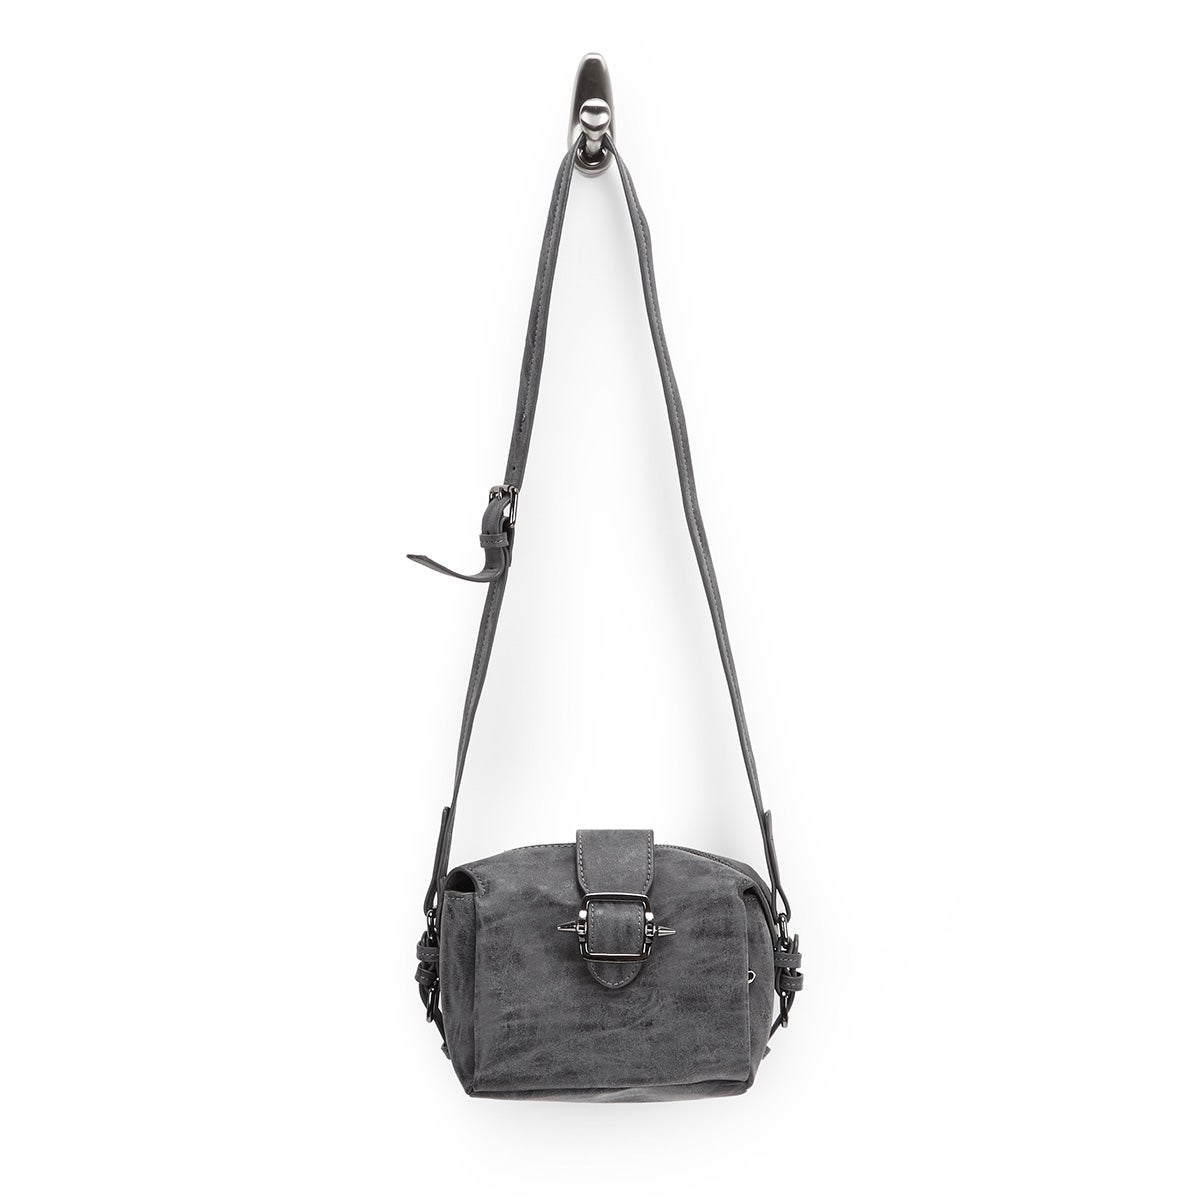 Lds dk grey buckle cross body bag